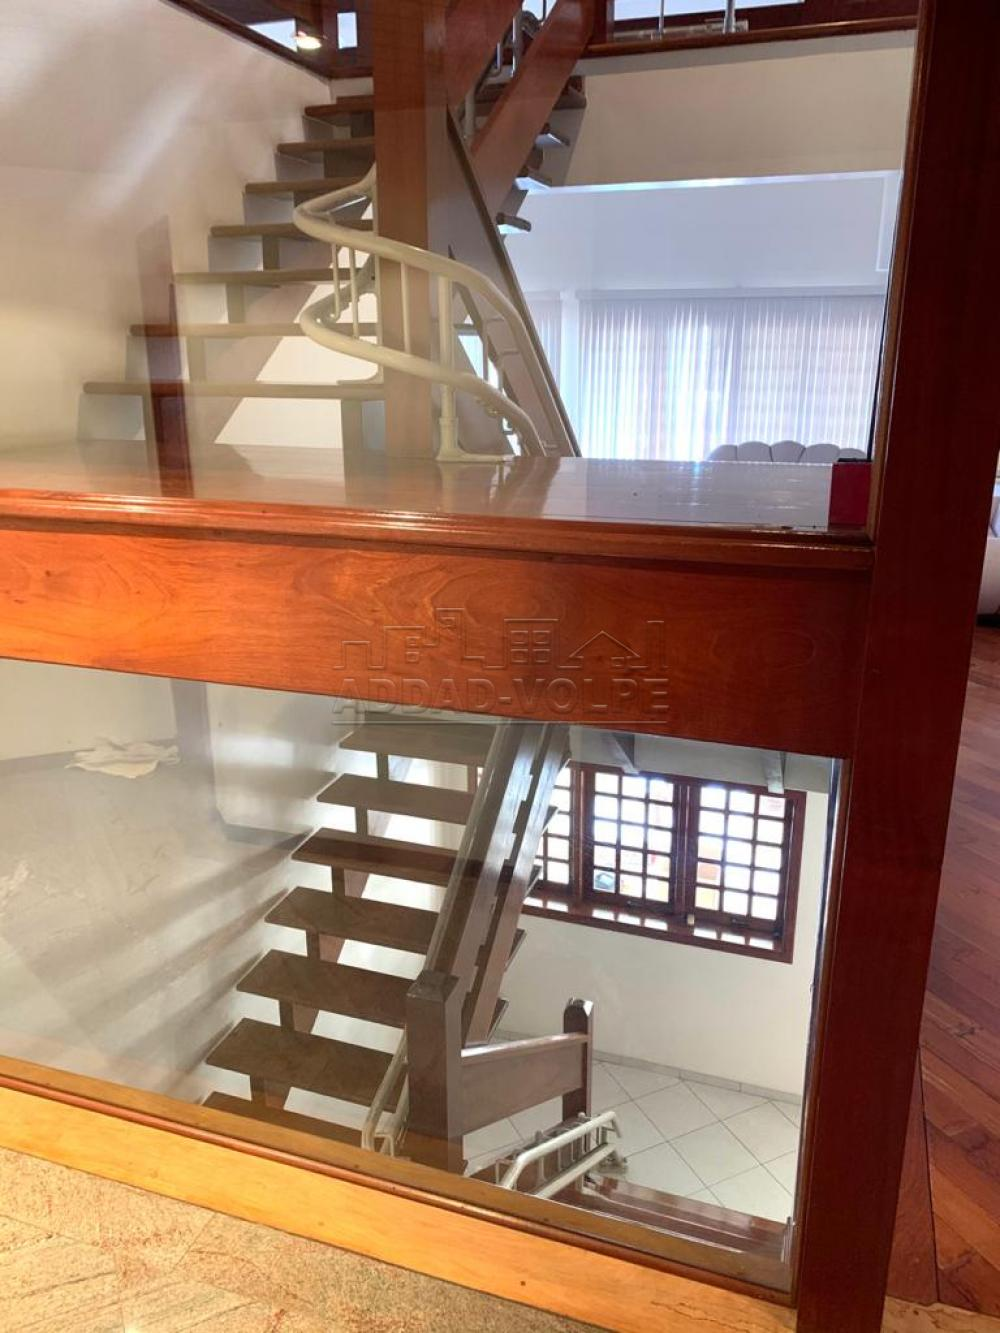 Alugar Casa / Sobrado em Bauru R$ 15.000,00 - Foto 6